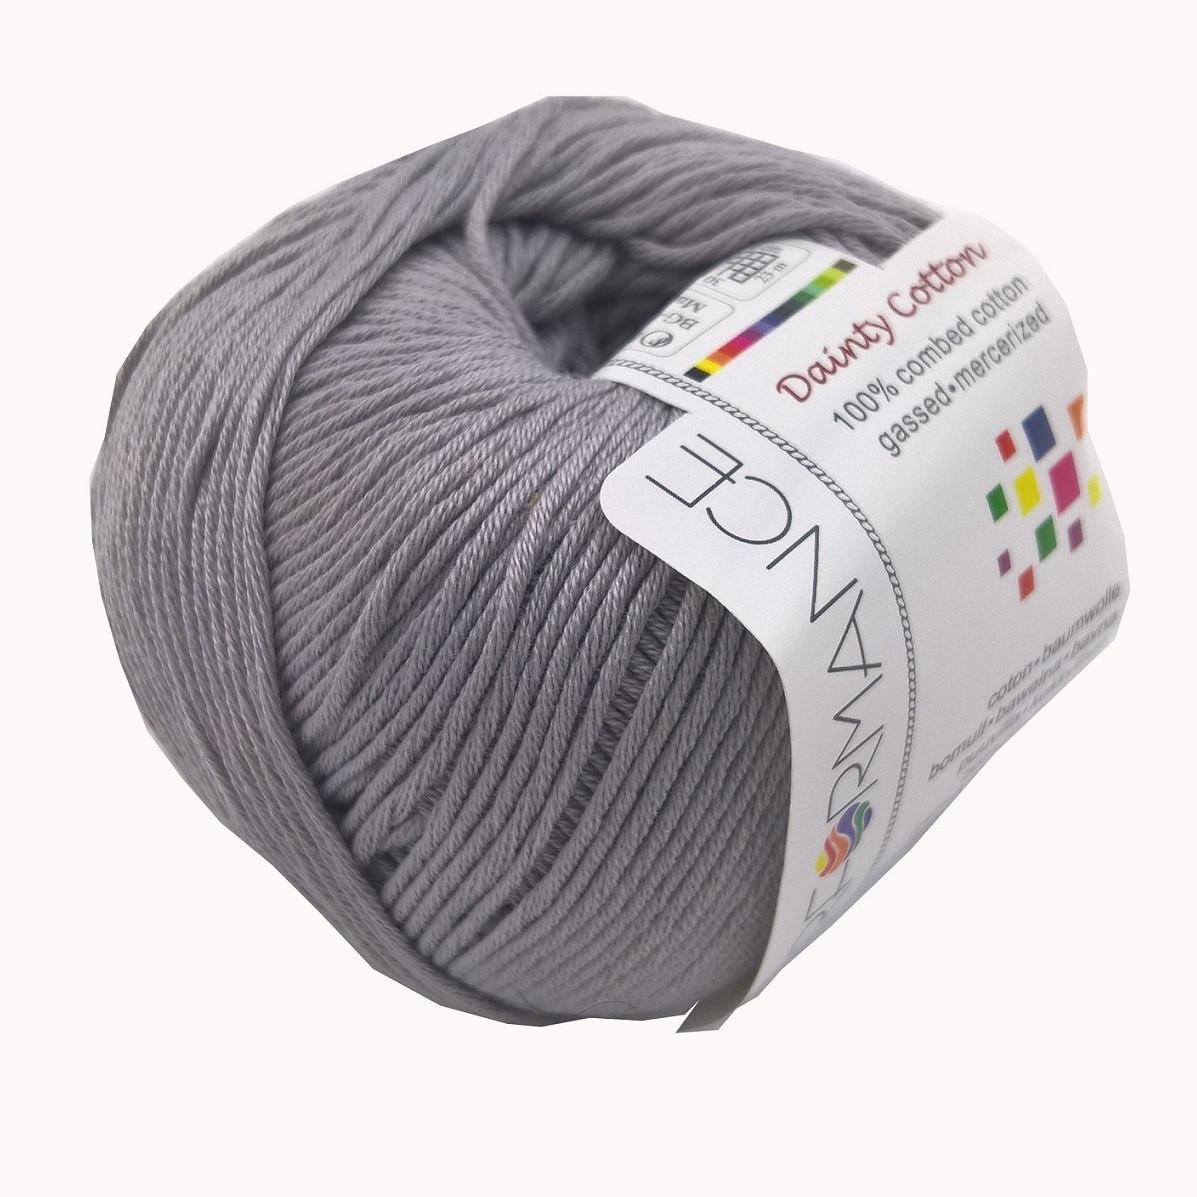 Пряжа Dainty Cotton, хлопок 100% (50г/155м) (232)